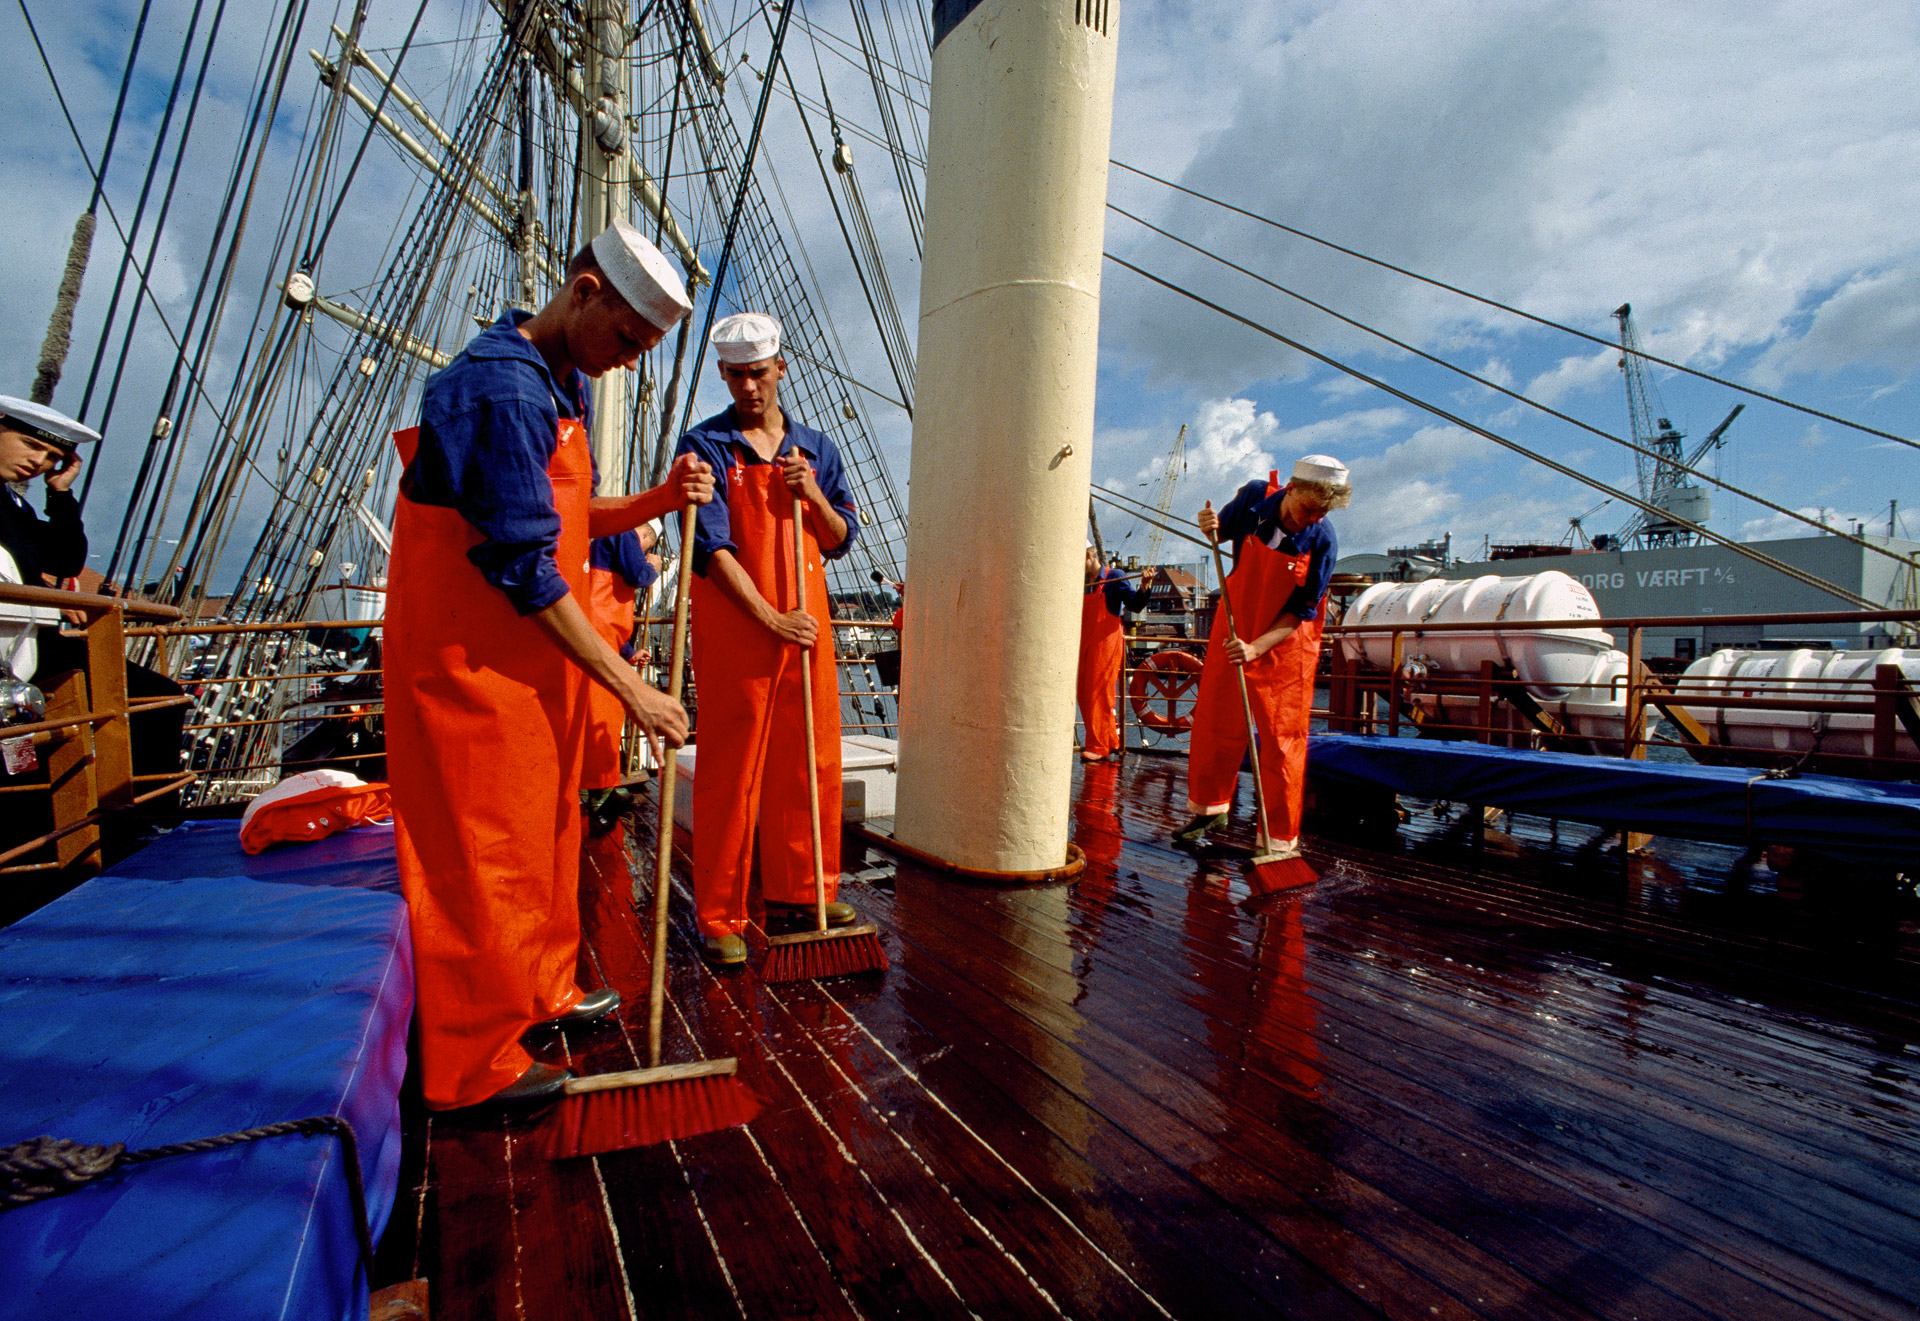 Men scrubbing the deck on Skoleskibet Danmark - the school ship Denmark